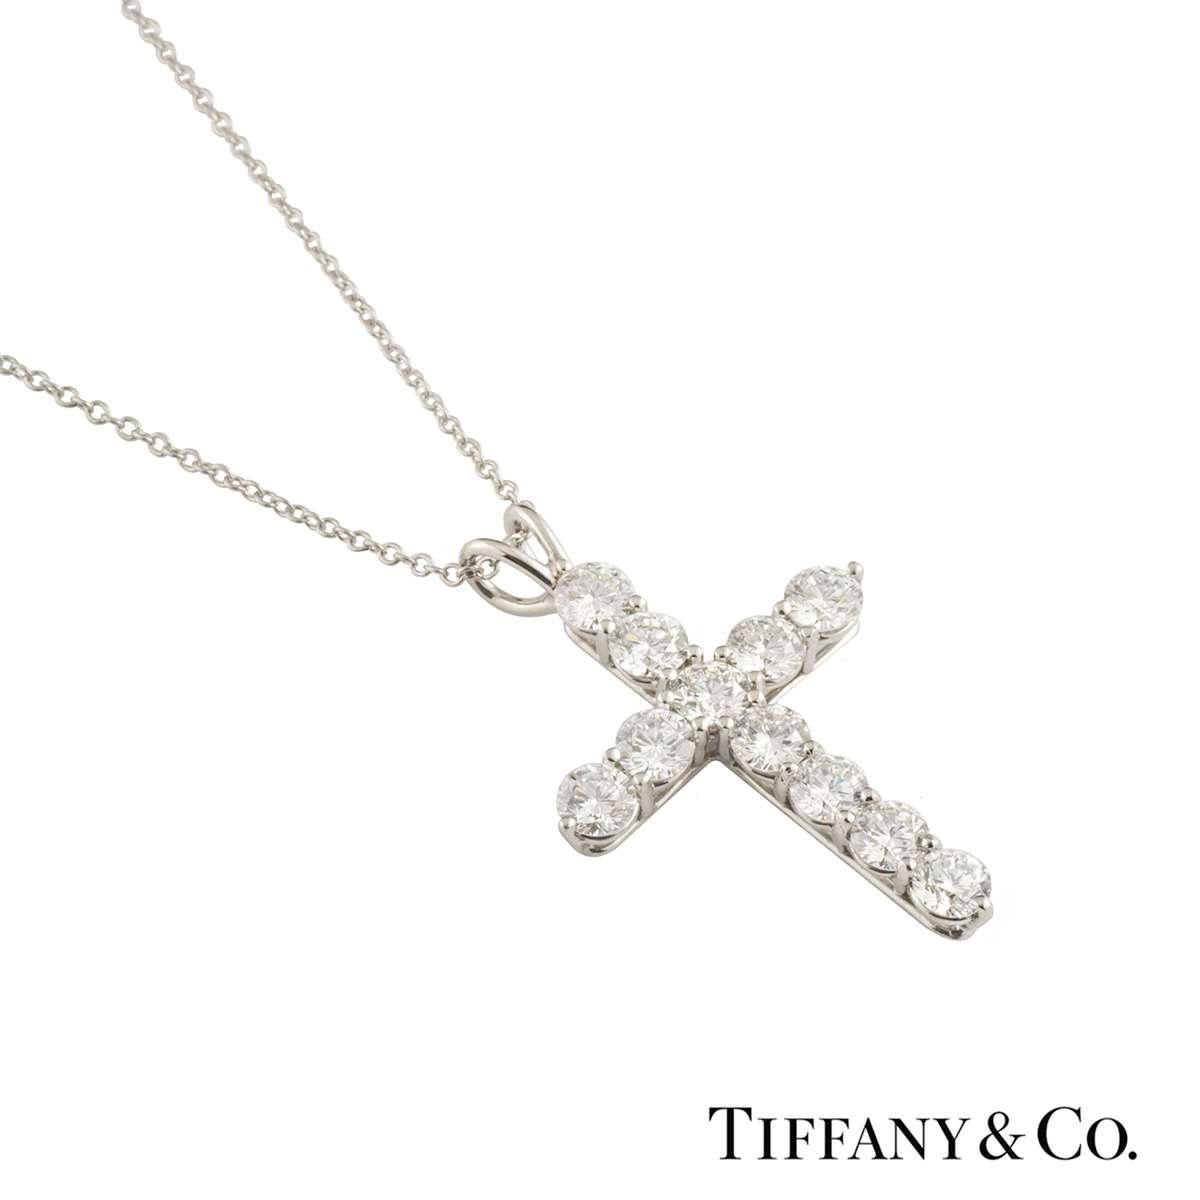 Tiffany & Co. Diamond Cross Pendant 1.65ct